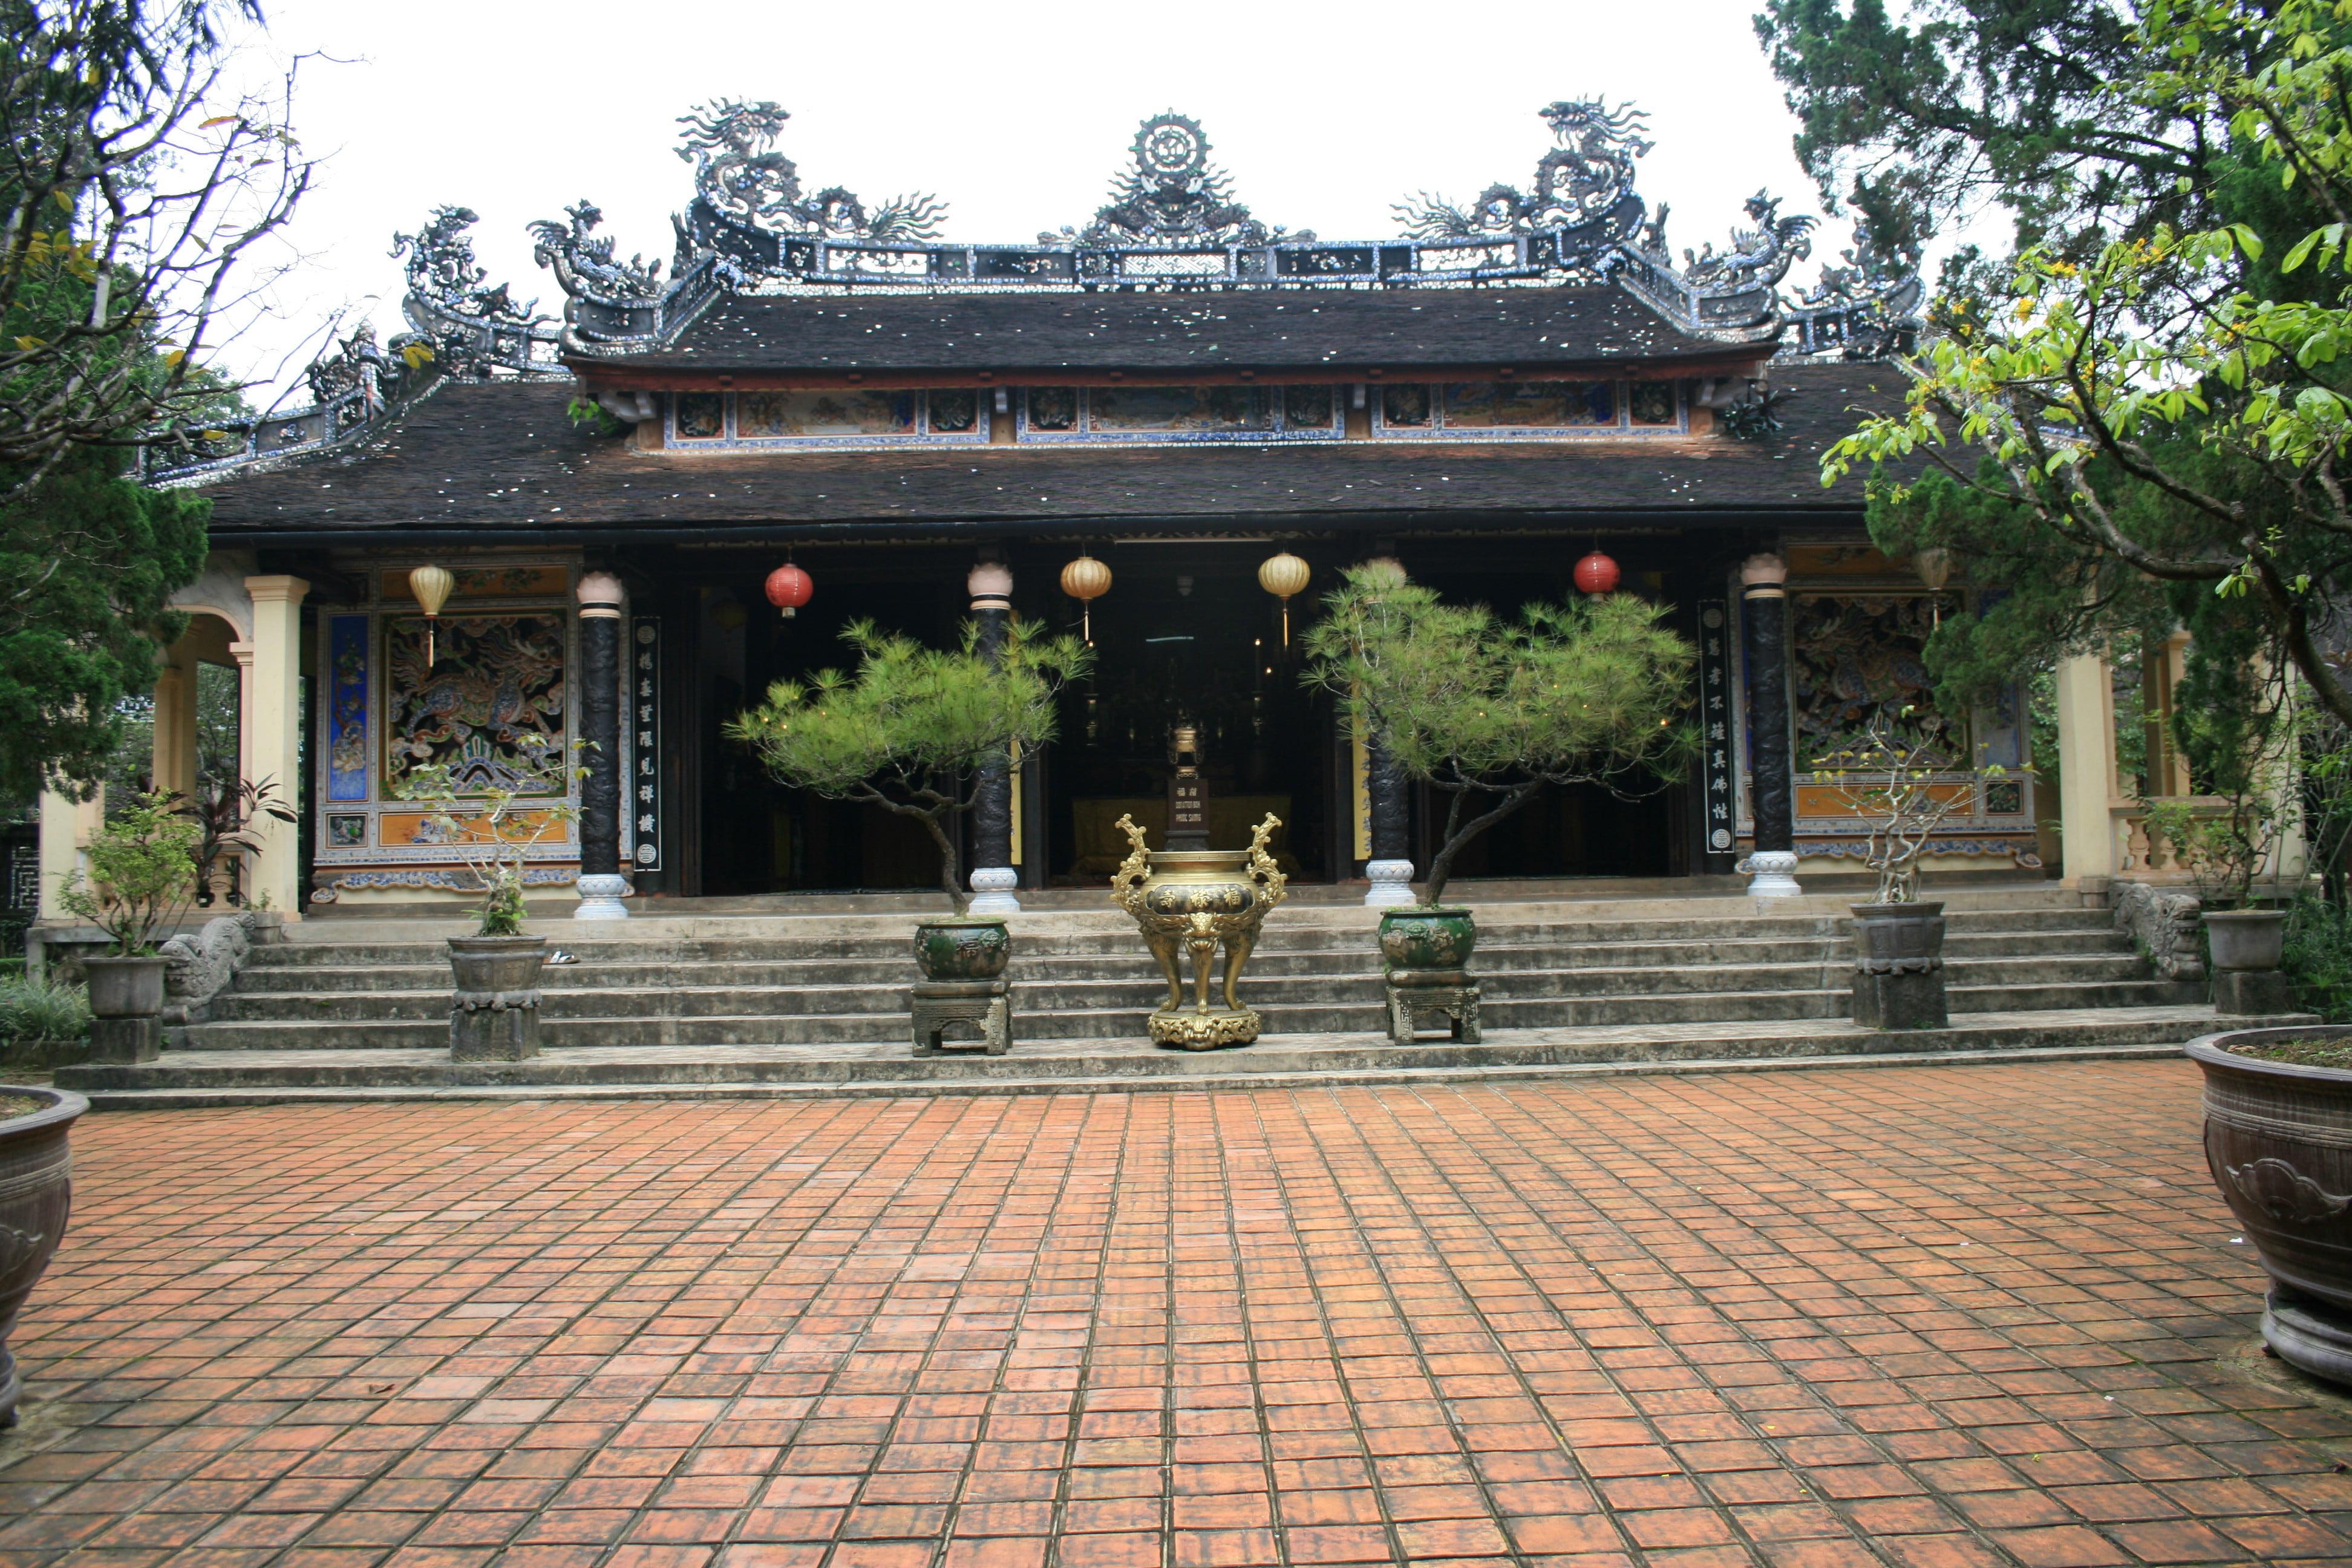 TOUR HA NOI – HA LONG – NINH BINH - DA NANG – HOI AN – HUE – HCMC – MEKONG DELTA 7